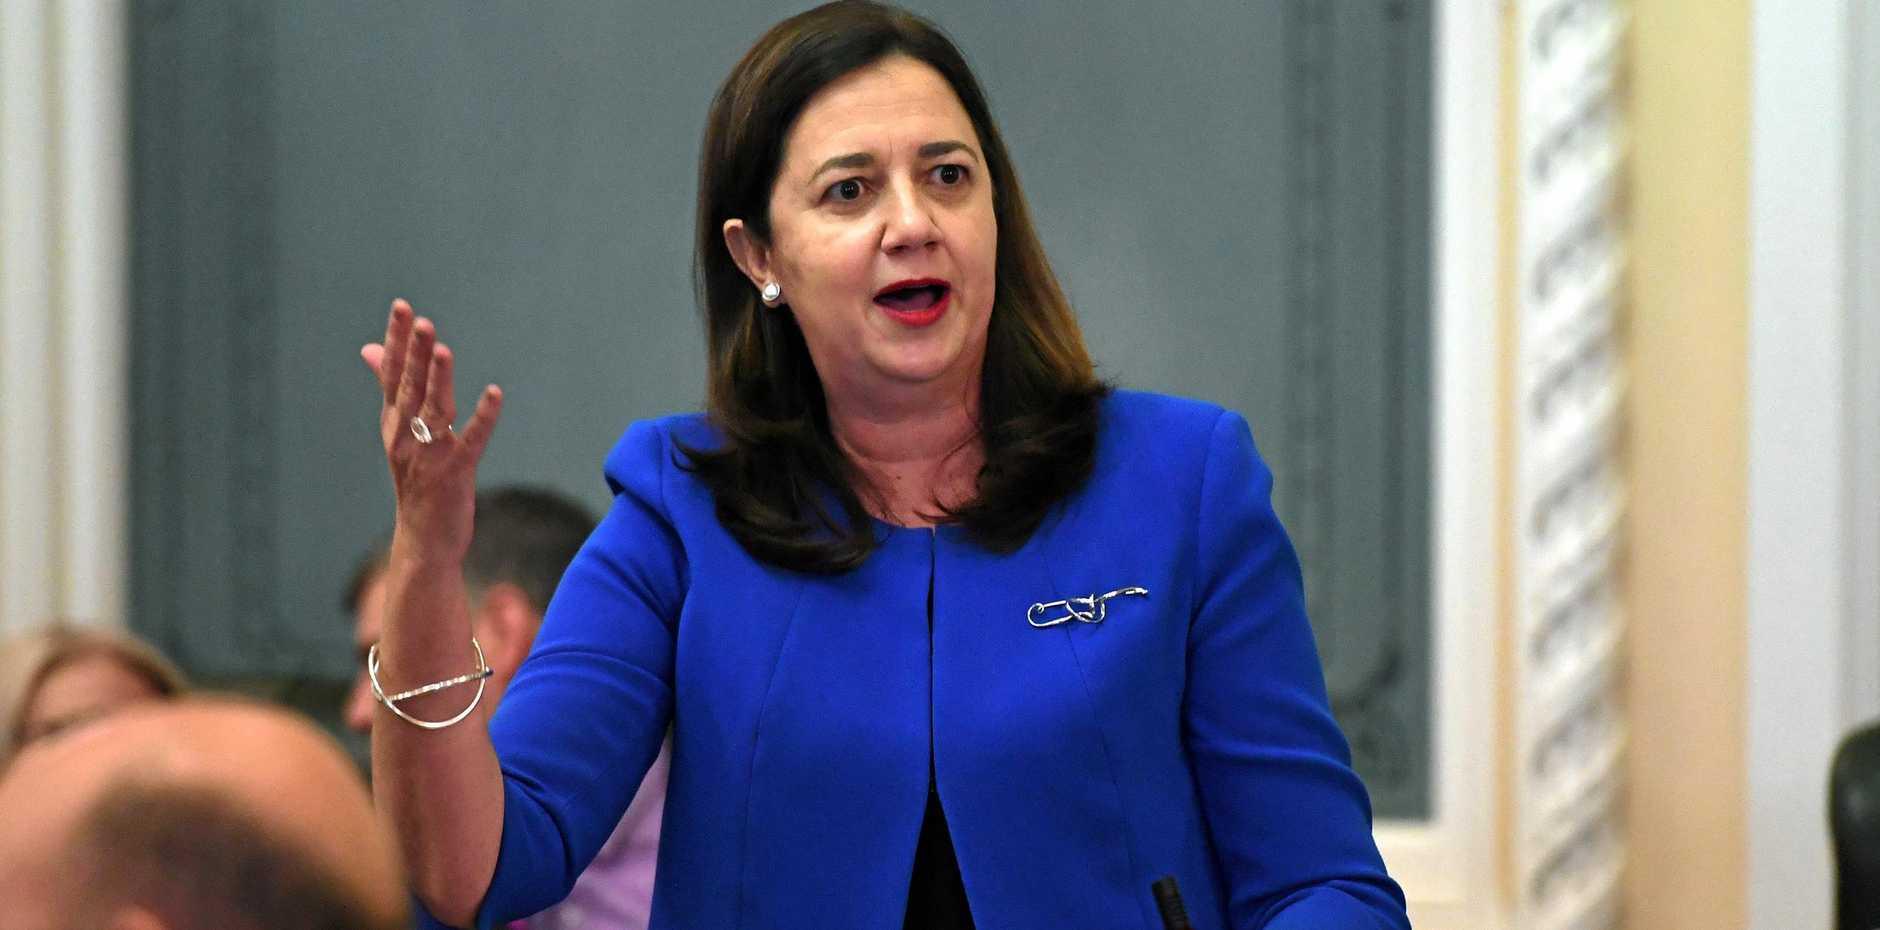 Premier referred to DPP on KAP staff